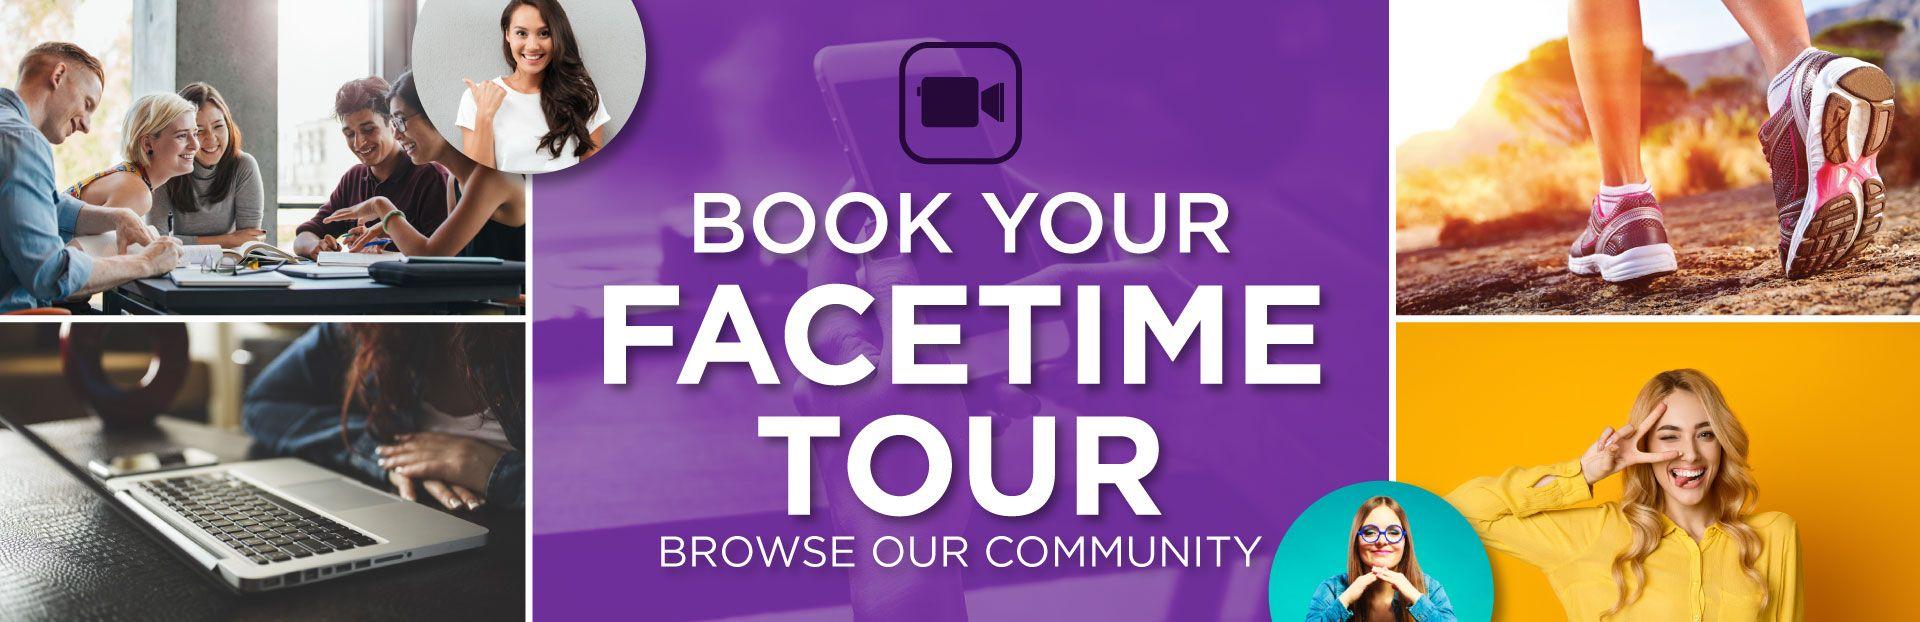 Book Your Facetime Tour | Browse Our Community